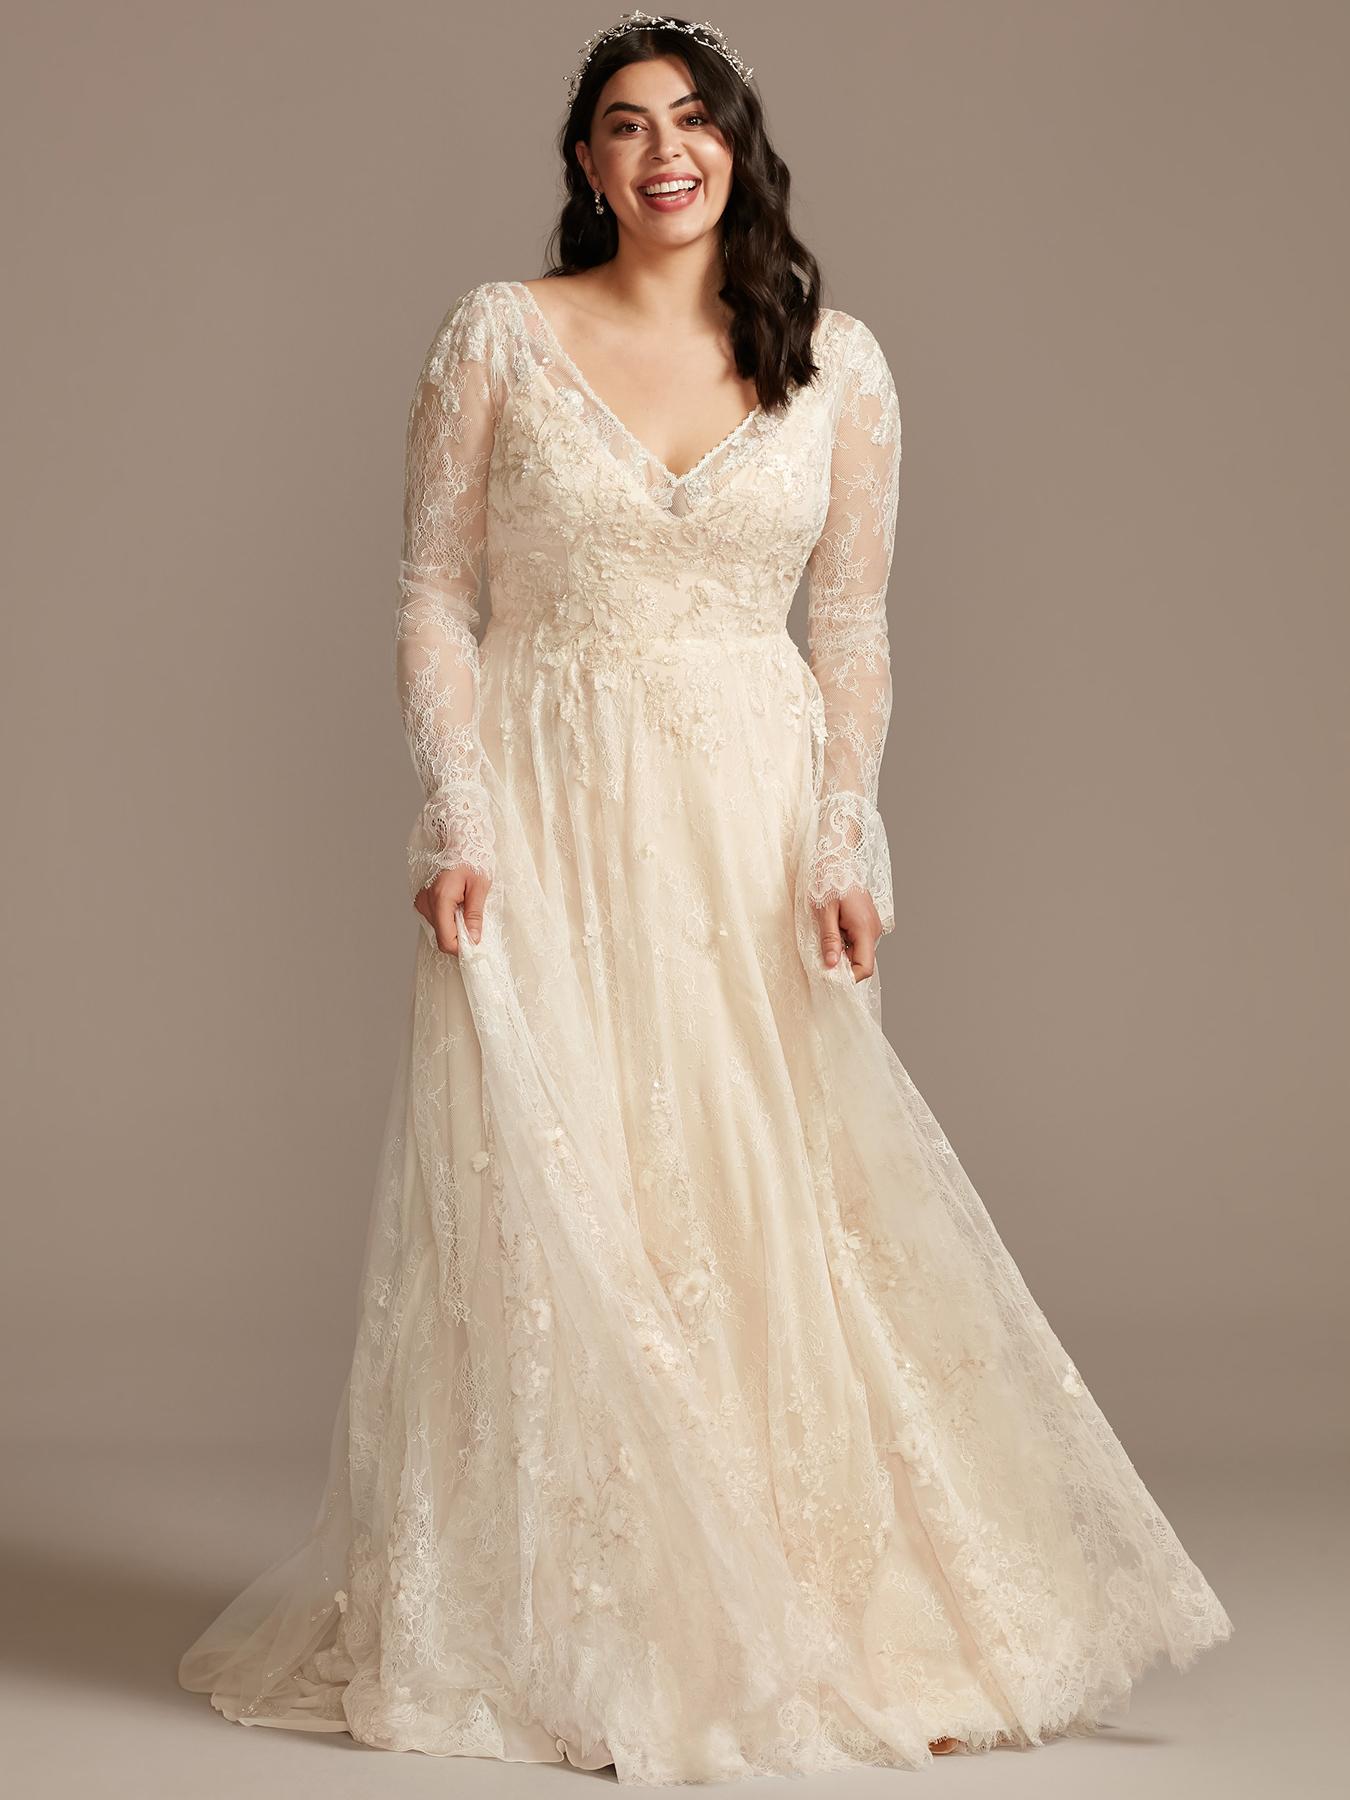 davids bridal v-neck lace long sleeve wedding dress spring 2021